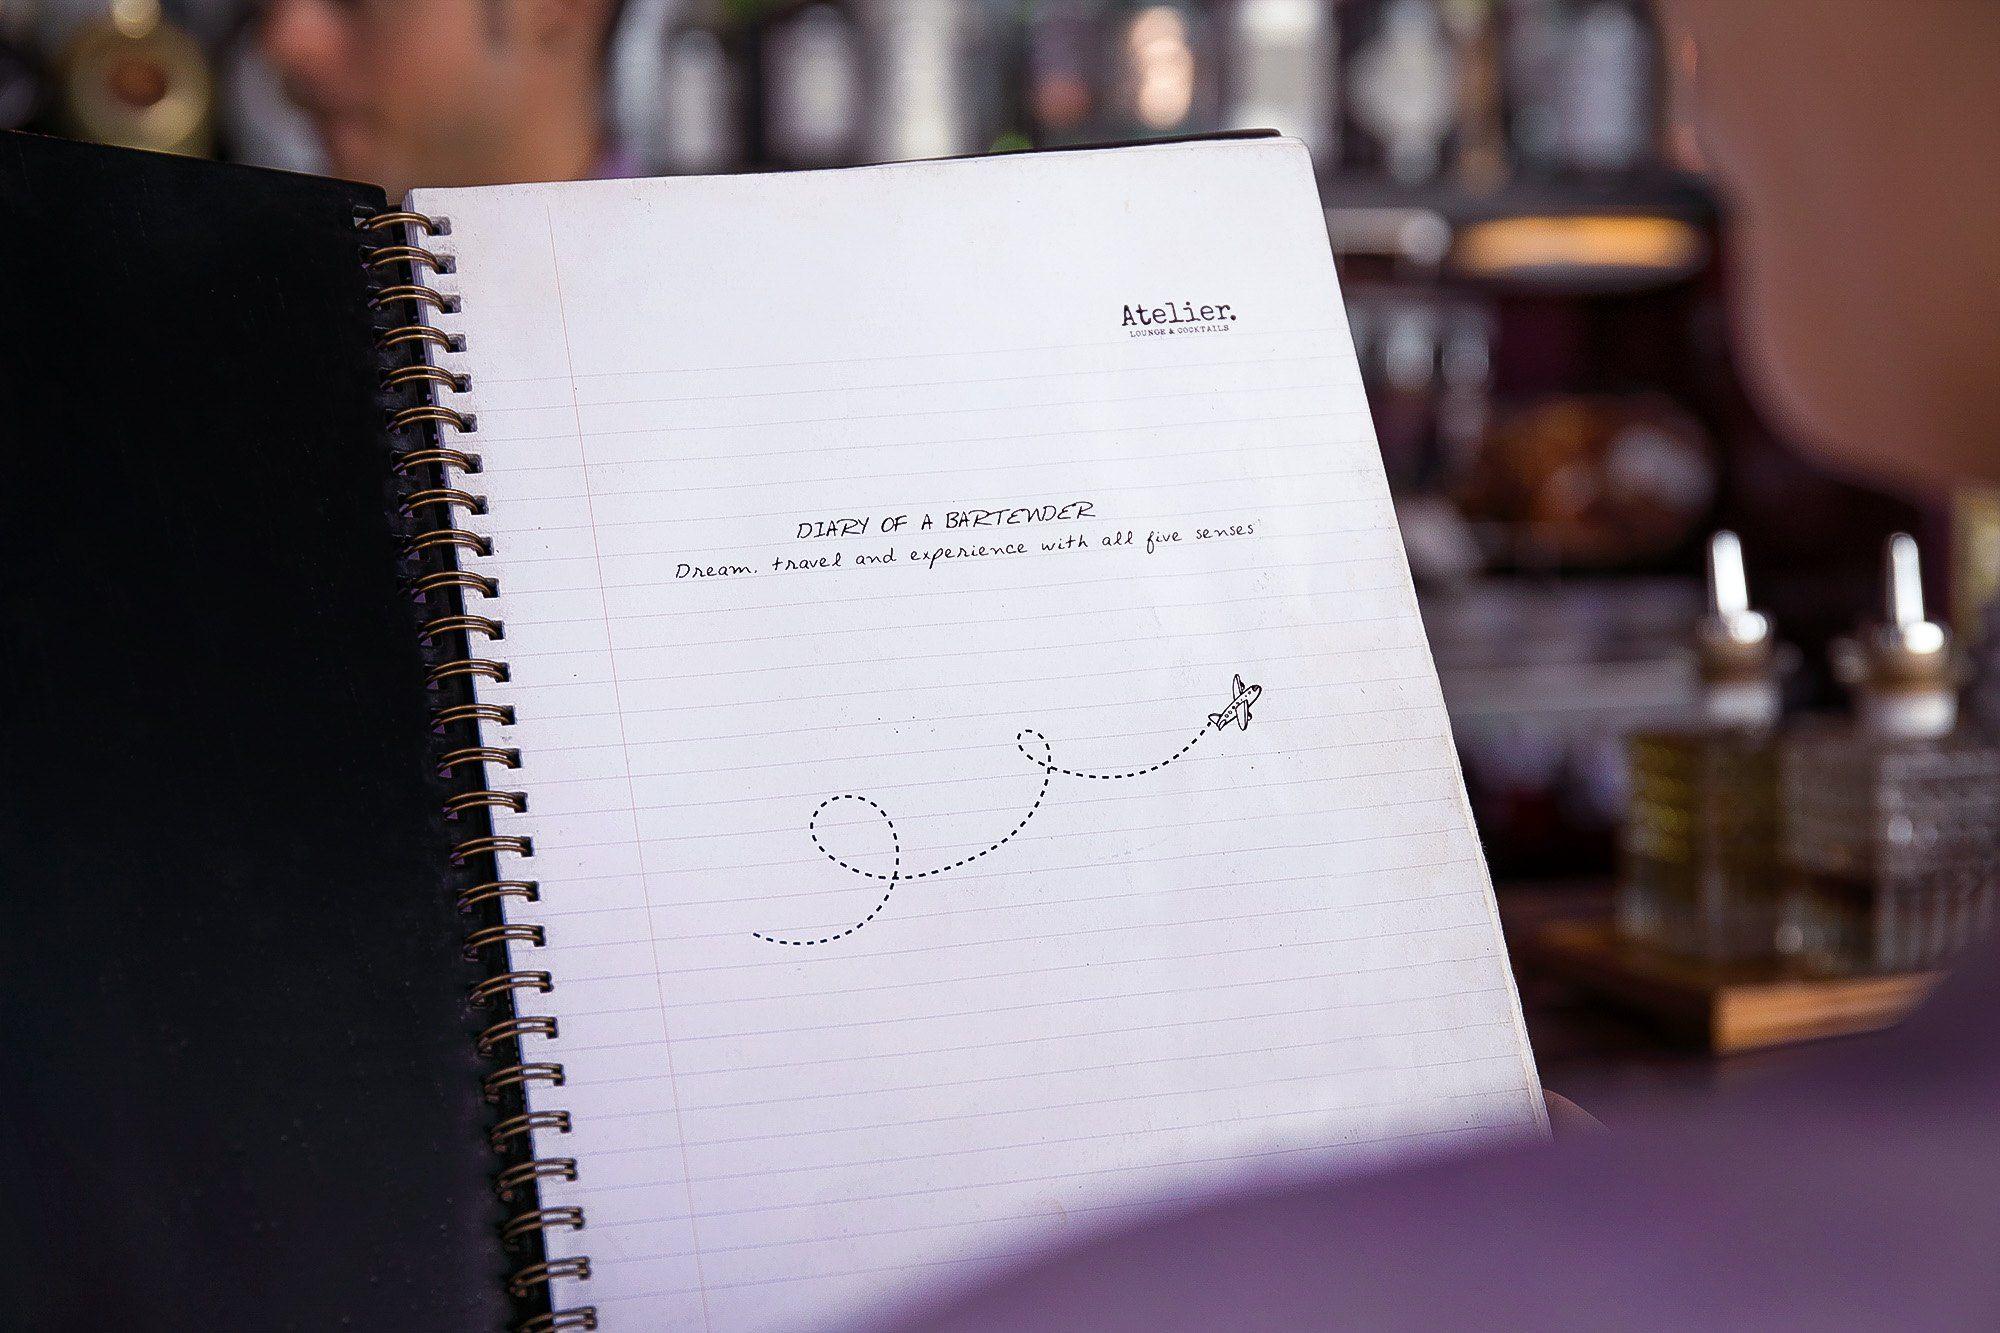 Fotografia Diario de un Bartender